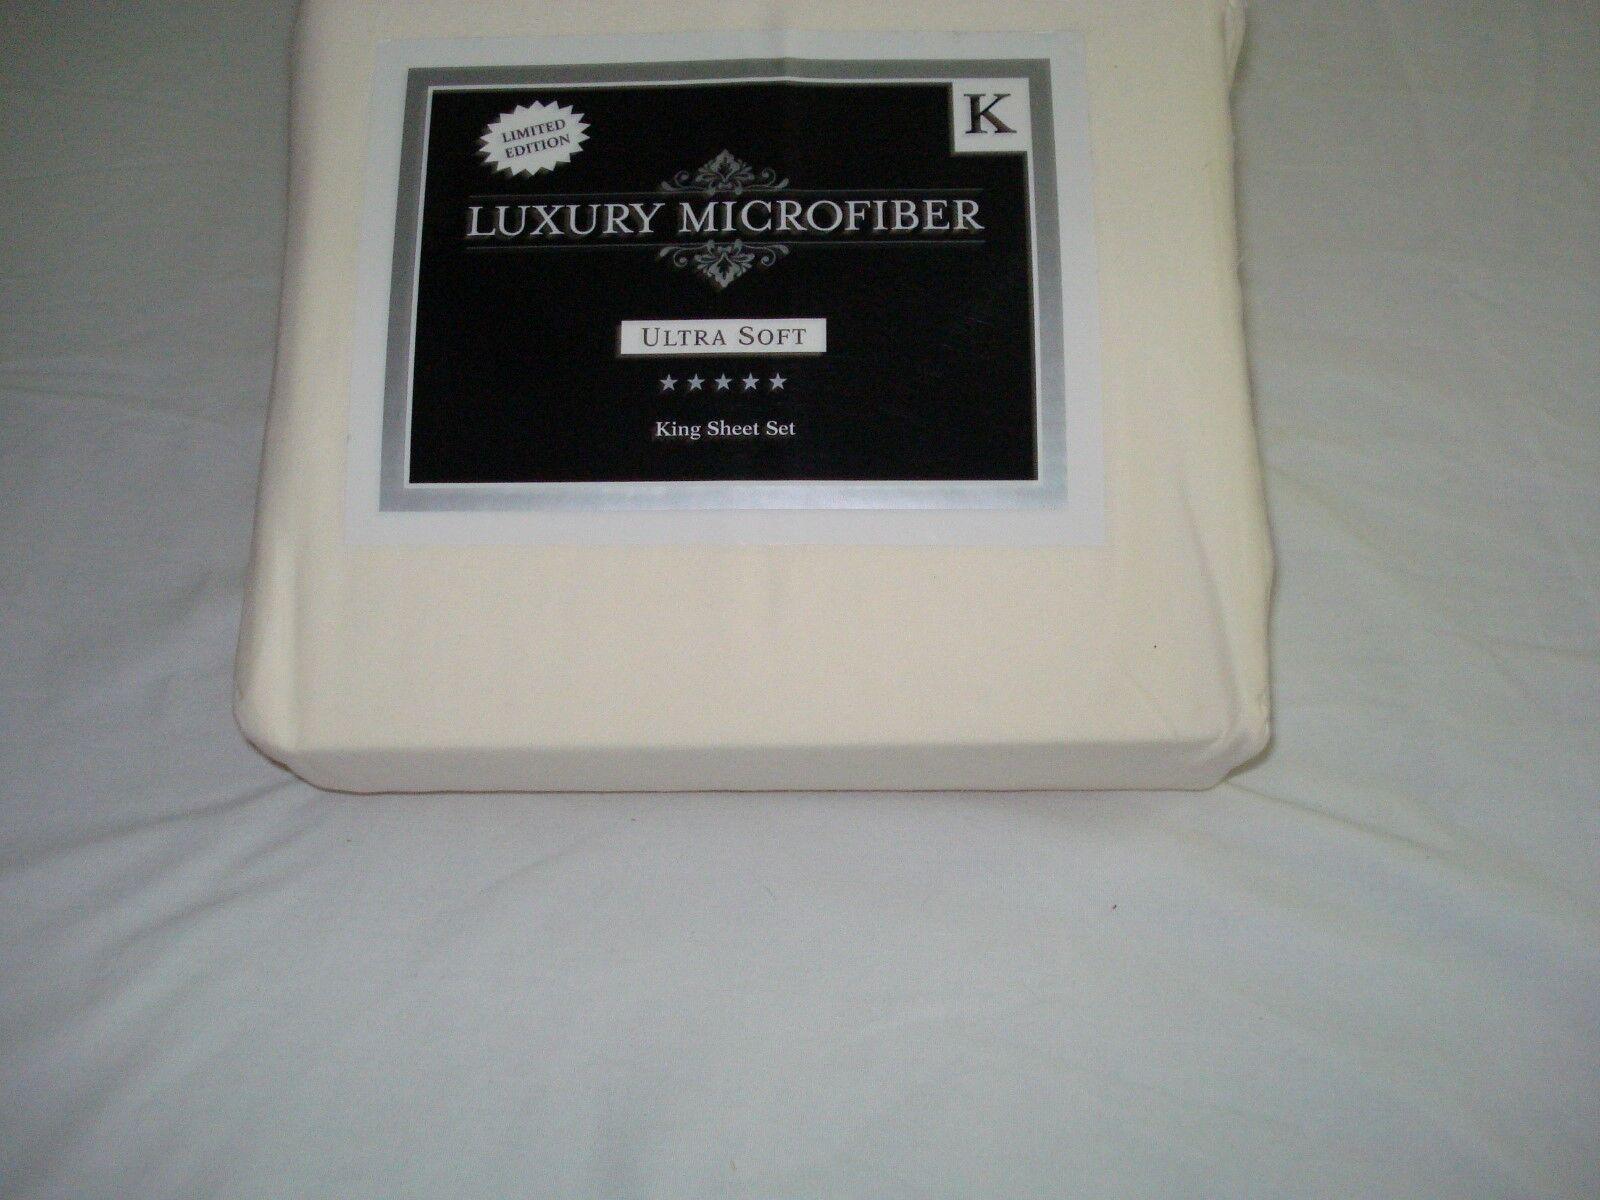 New Limited Edition King Sheets set wrinkle resistant Cre'me Mist color